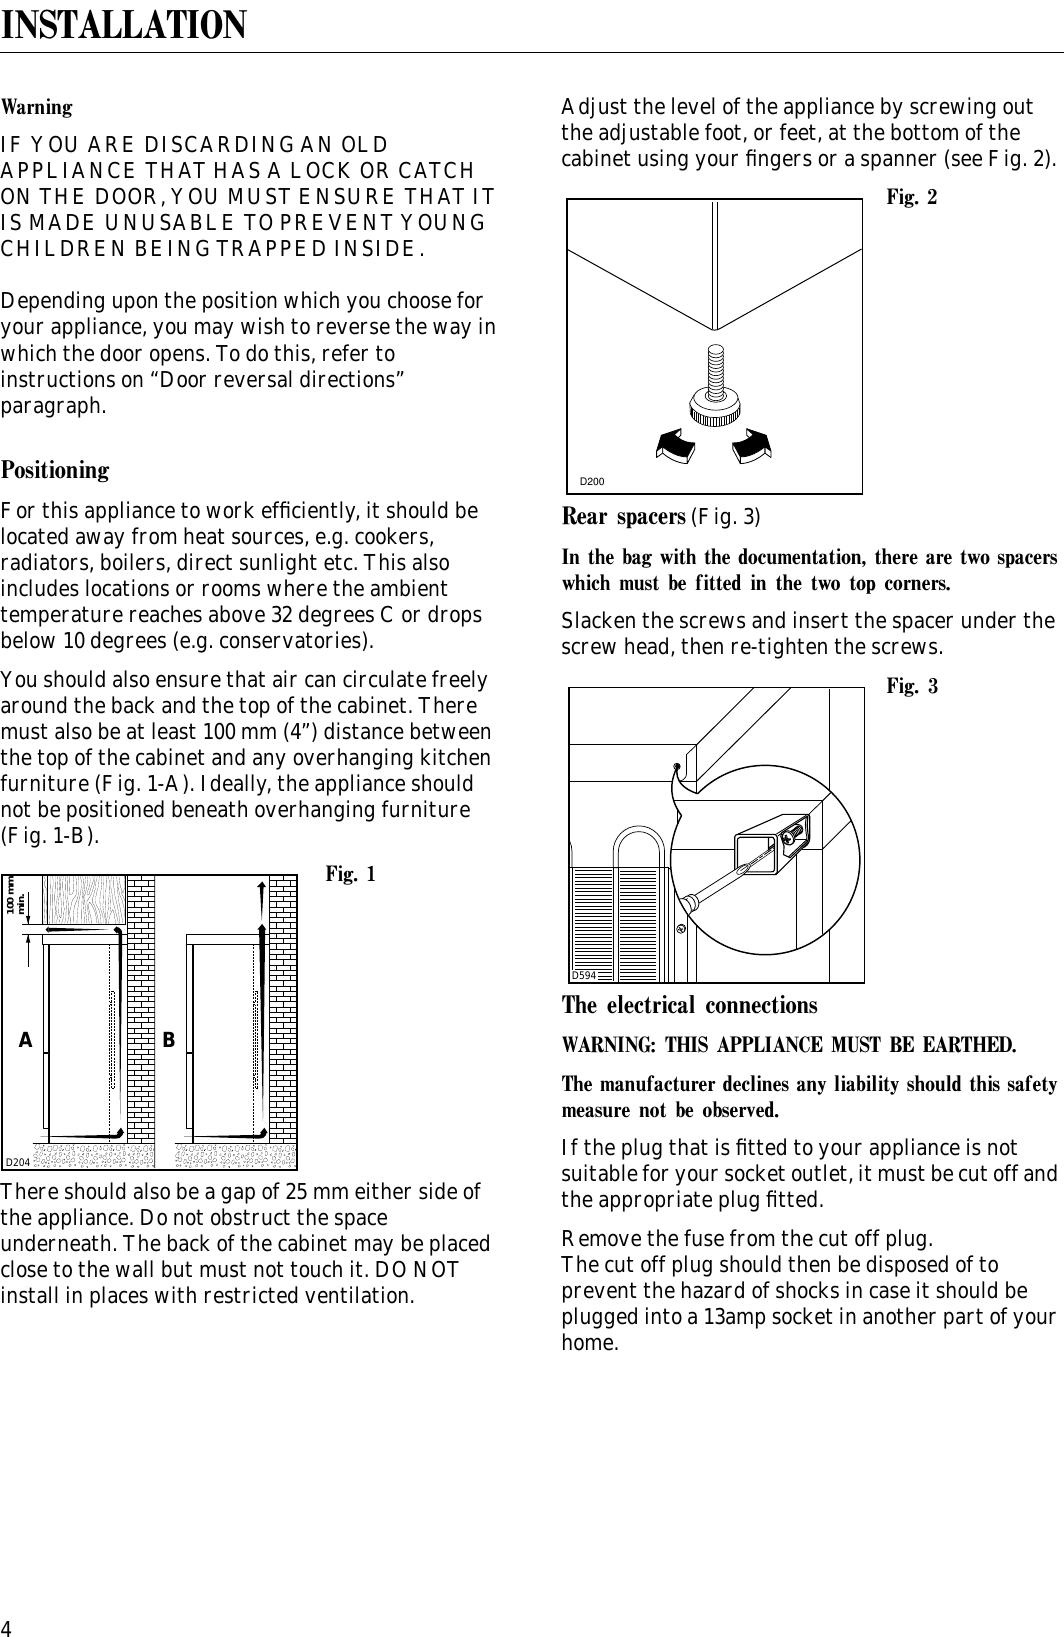 Zanussi Zfca 62 26 Users Manual